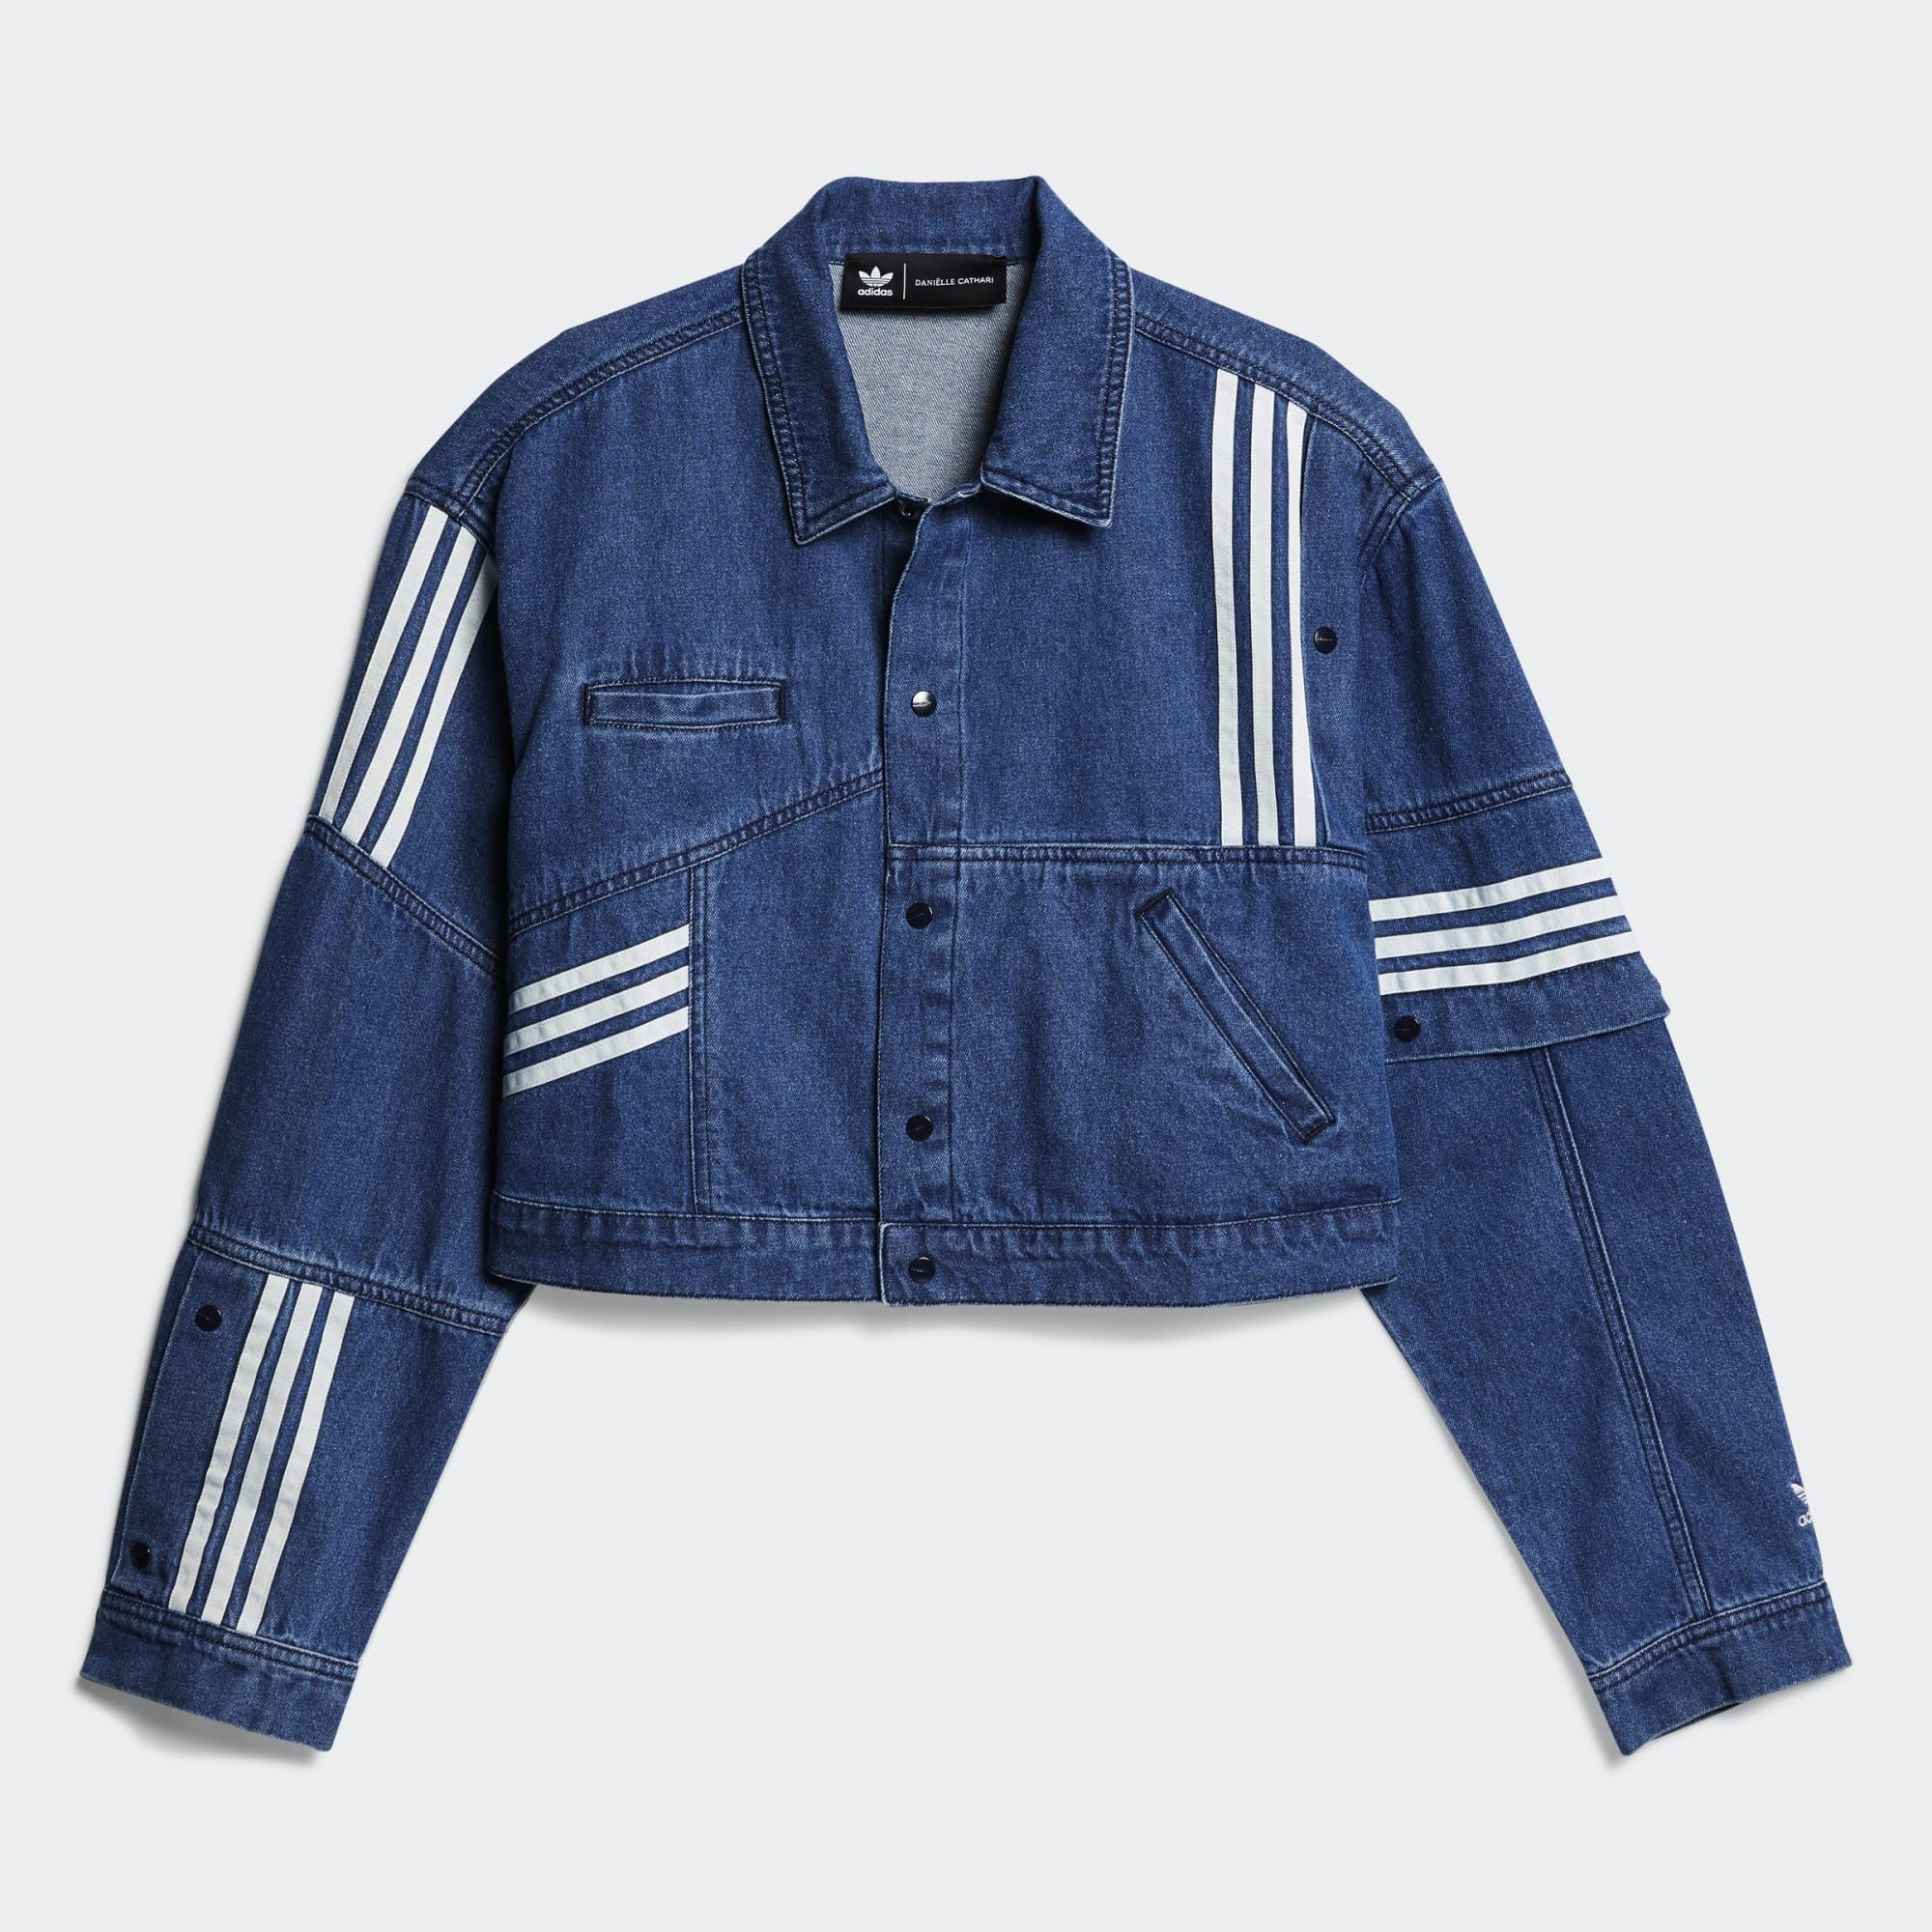 Adidas Denim Jacket Blue Adidas Uk Denim Jacket Women Denim Jacket Denim Women [ 2000 x 2000 Pixel ]